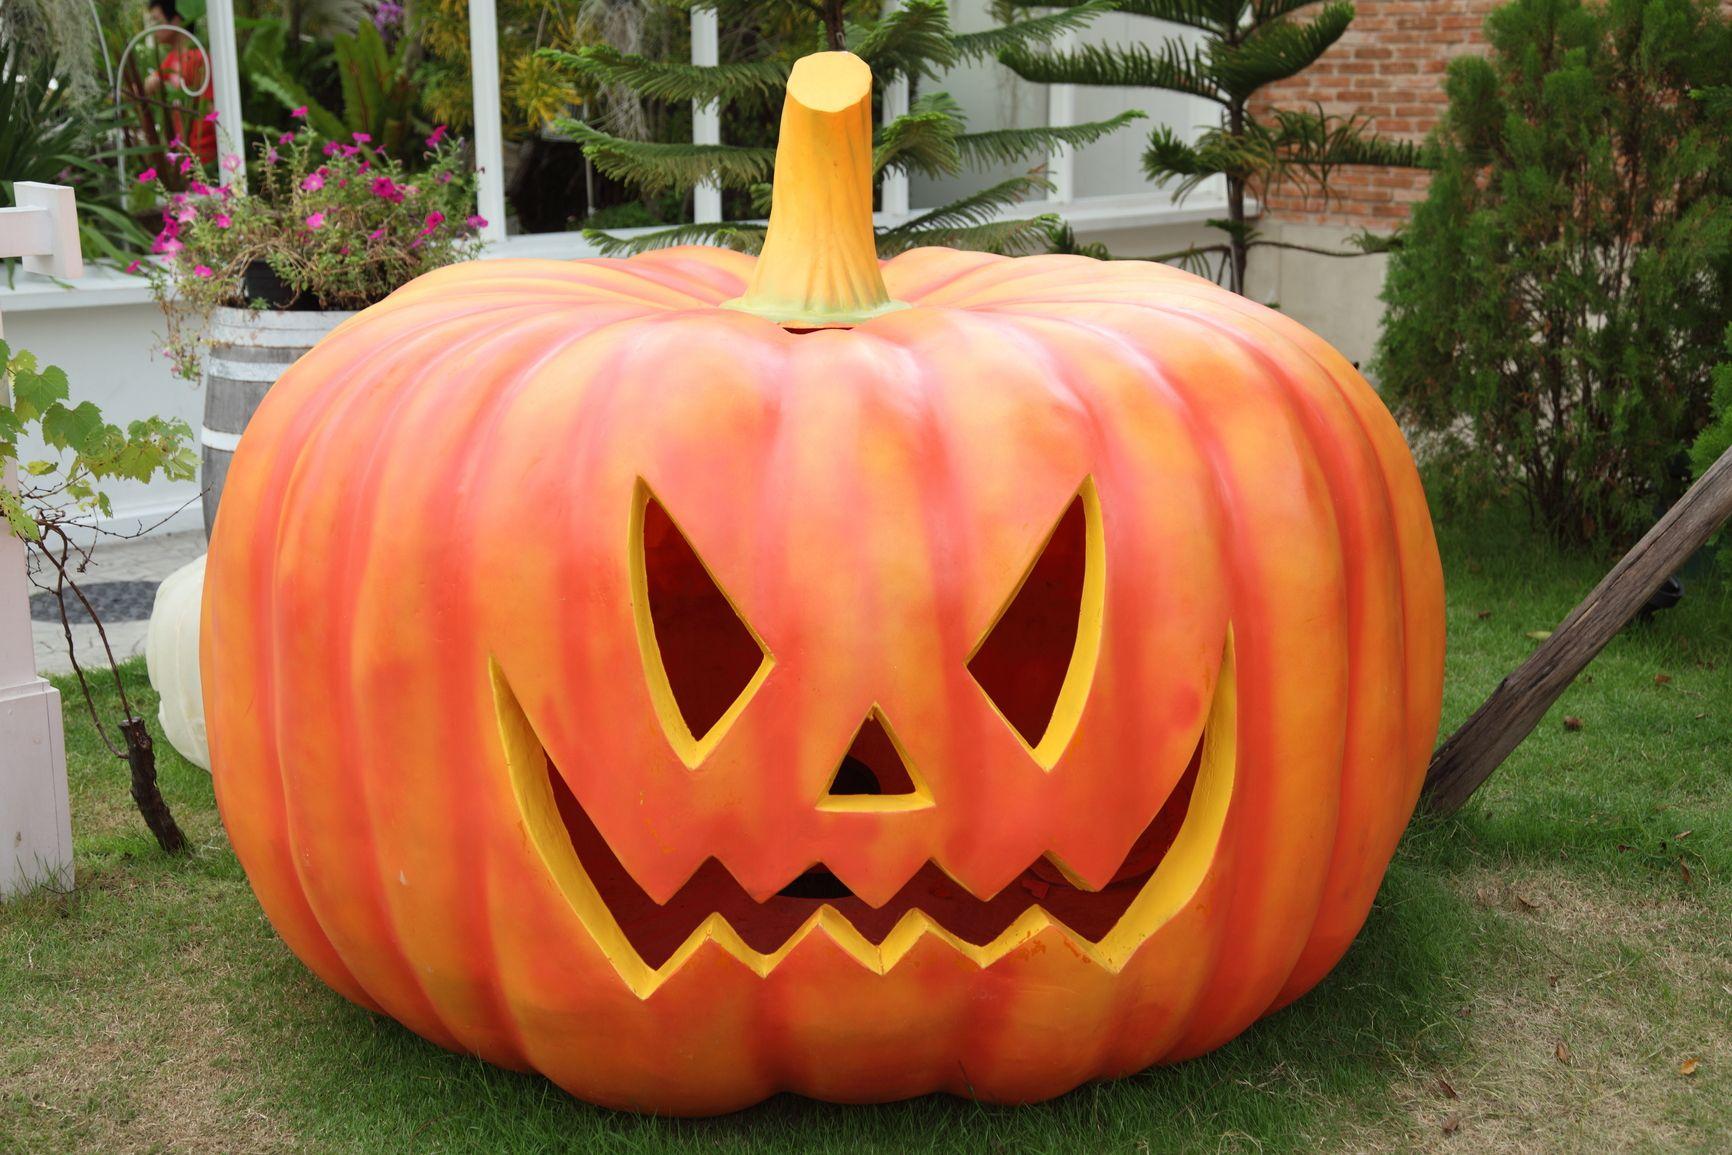 halloween pumpkin design ideas carvings and templates | spooky